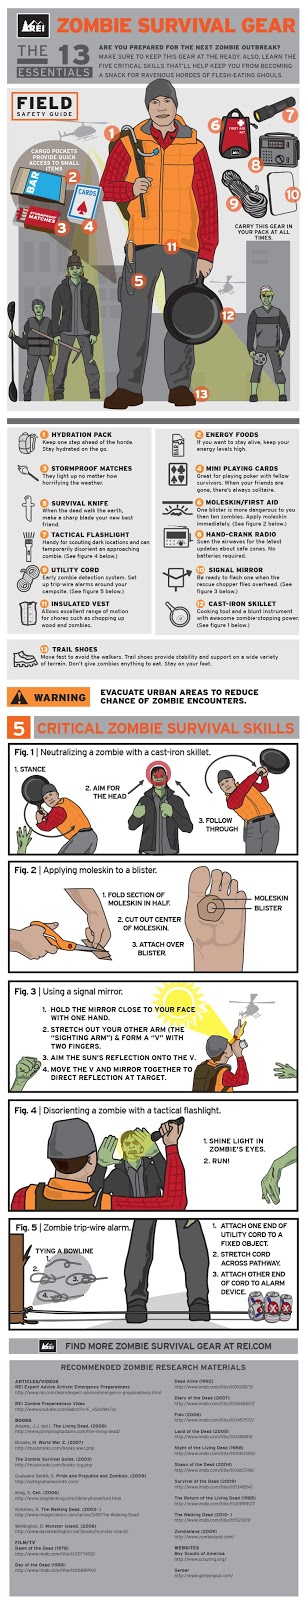 Zombie Apocalypse Survival Gear REI Infographic